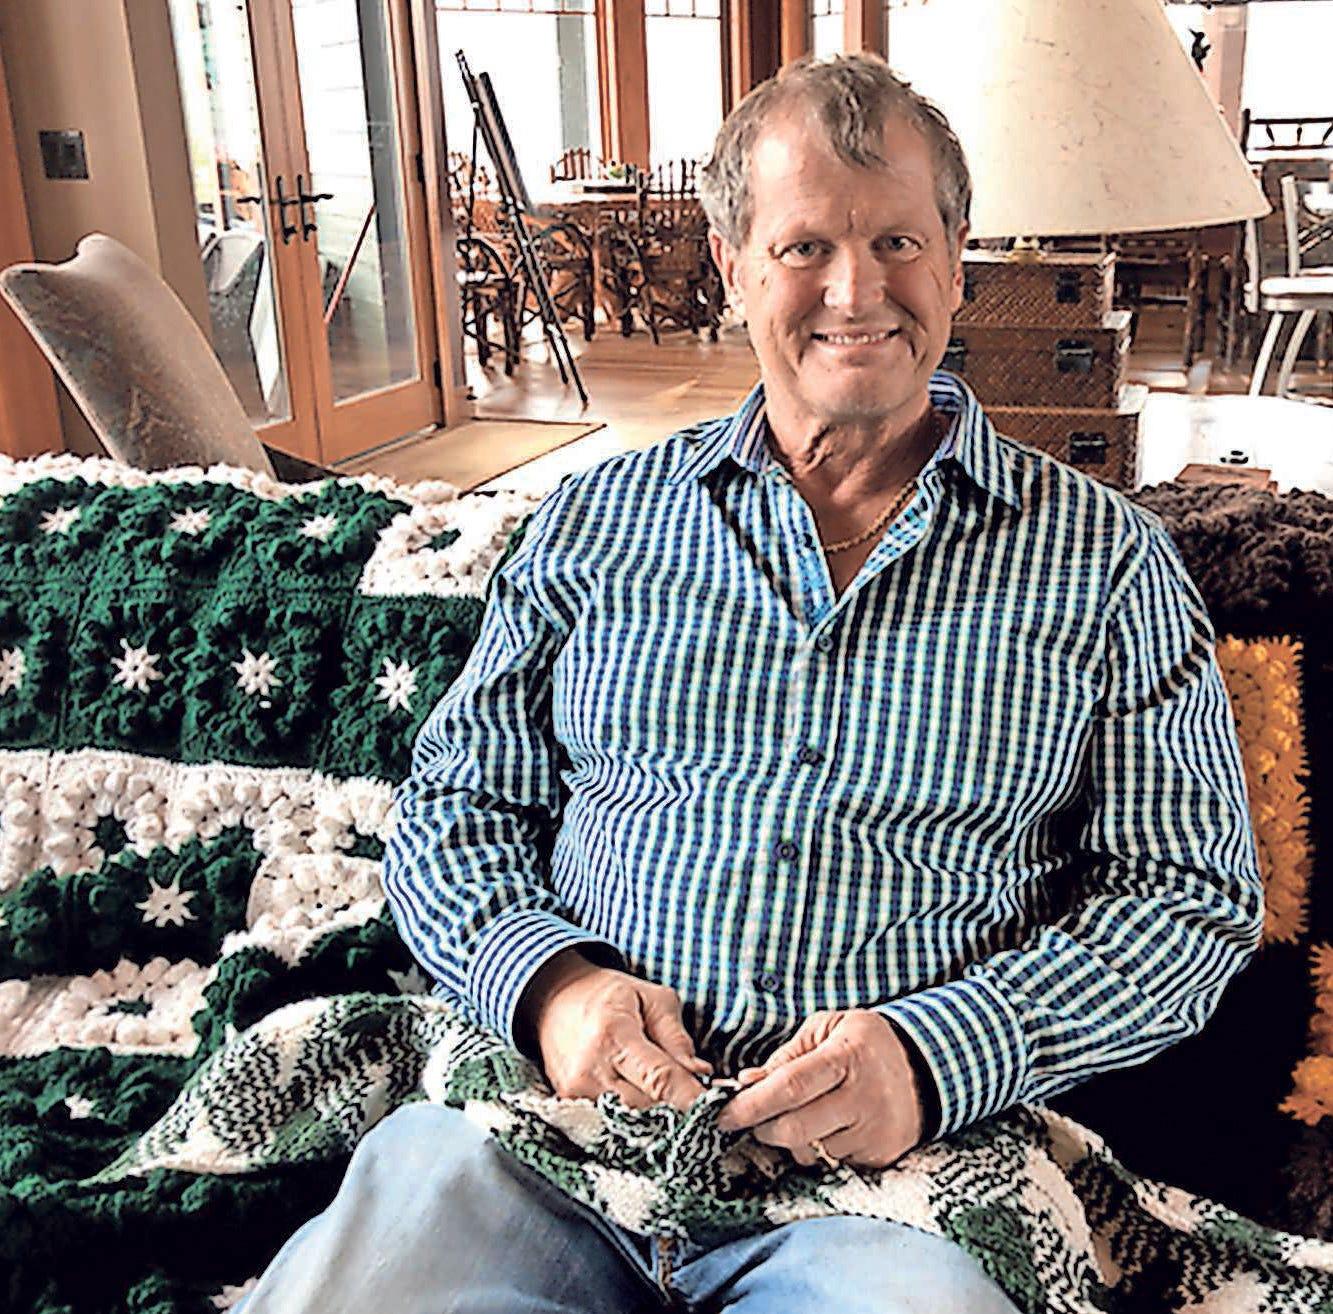 Handmade: Orthopedic surgeon loves to crochet